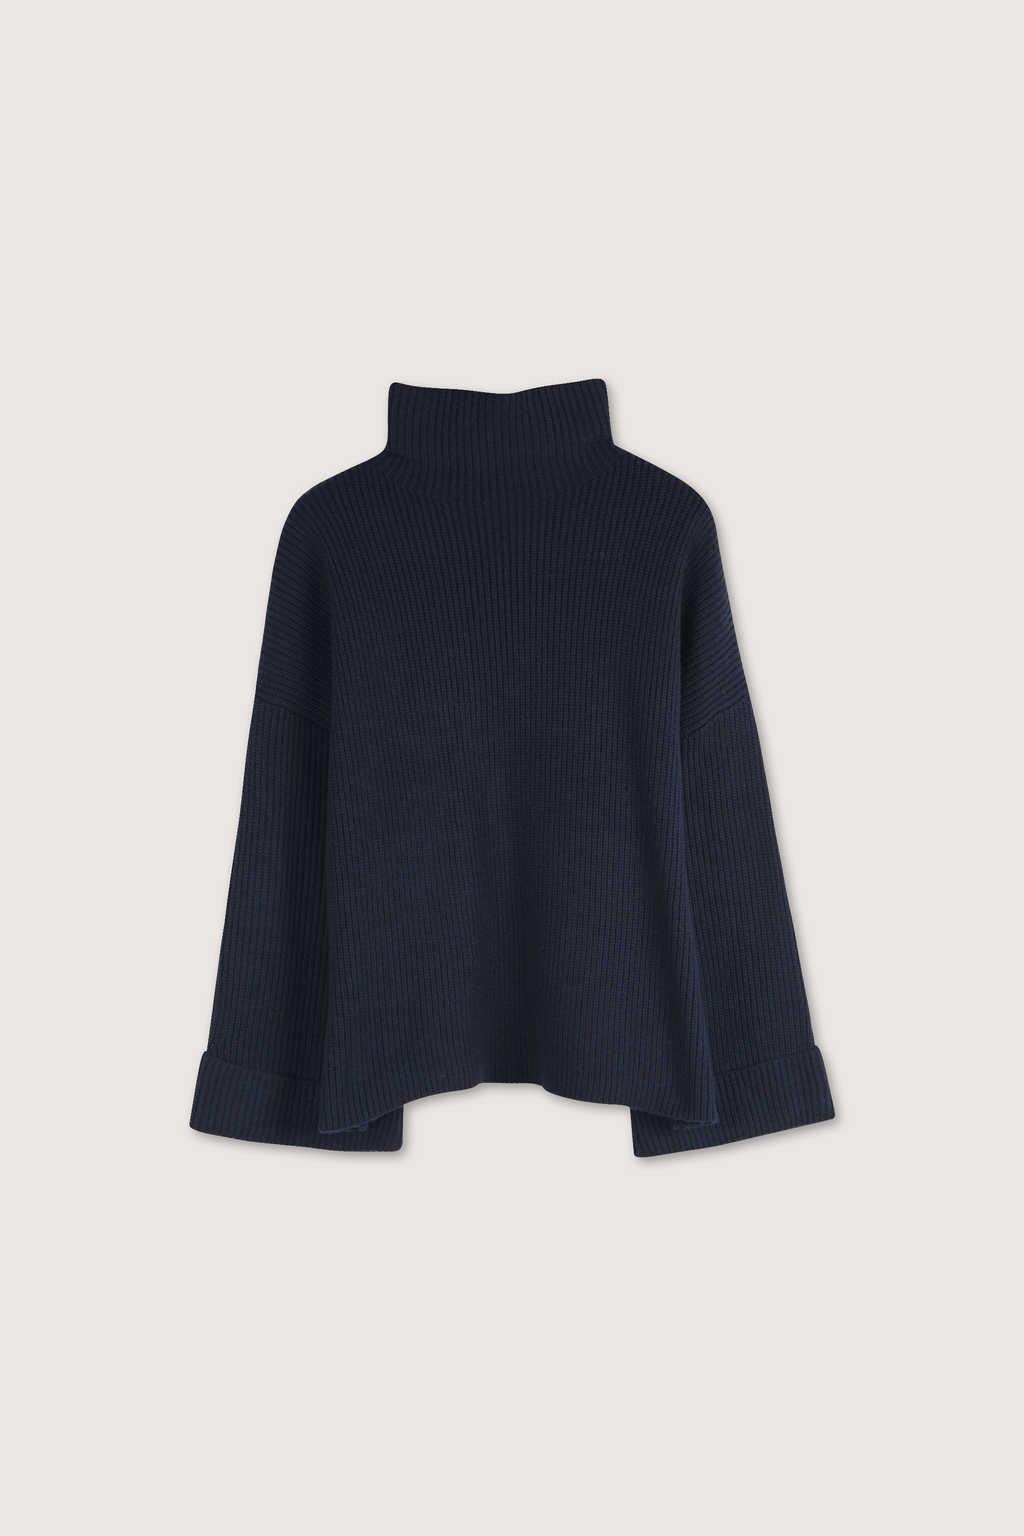 Sweater 1828 Navy 13